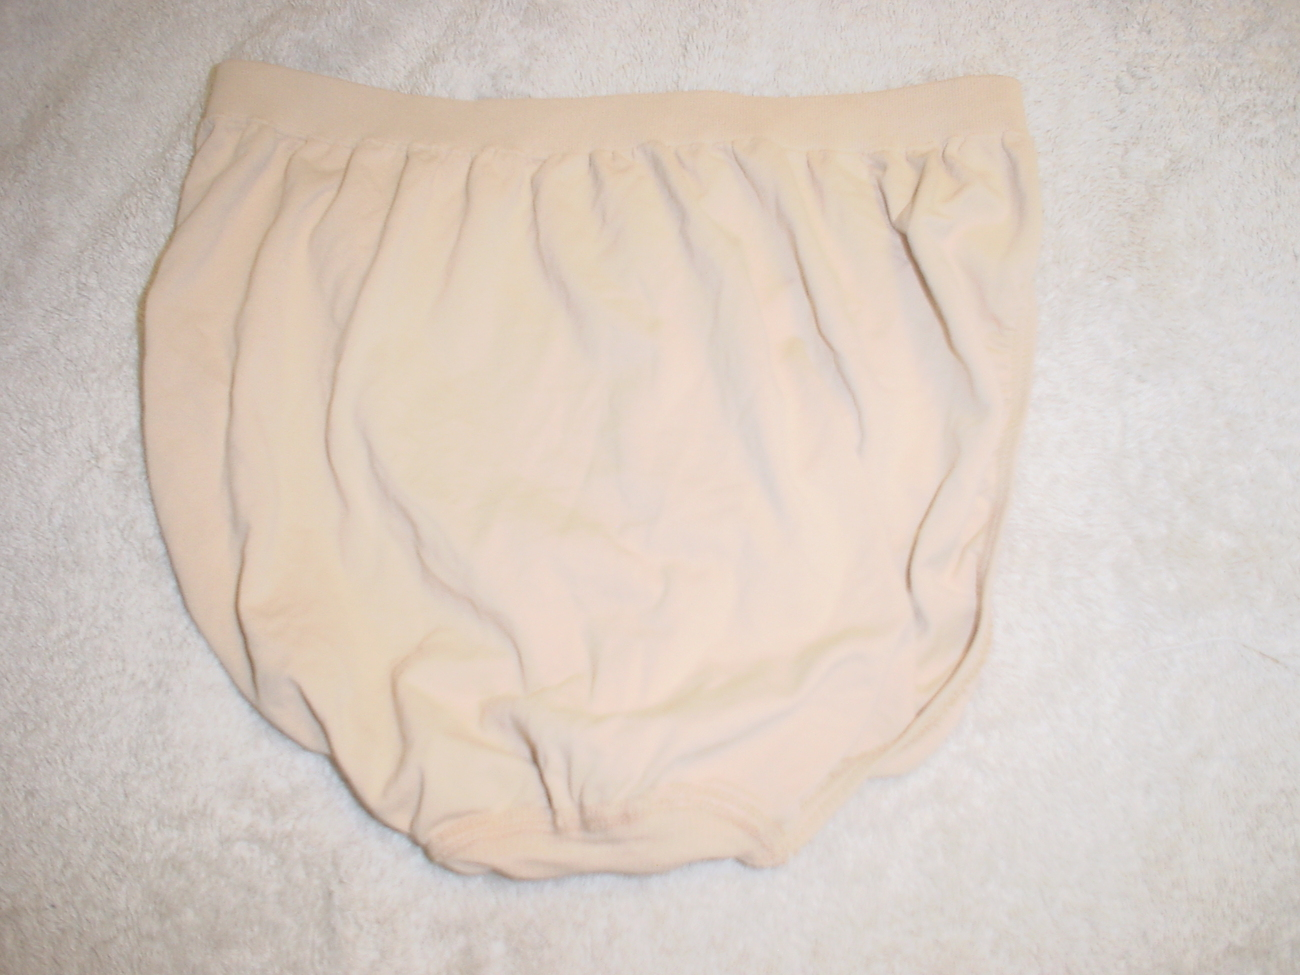 Jockey Seamfree Panty 8/XLarge Nude SP-Slightly Imperfect Lot of 3